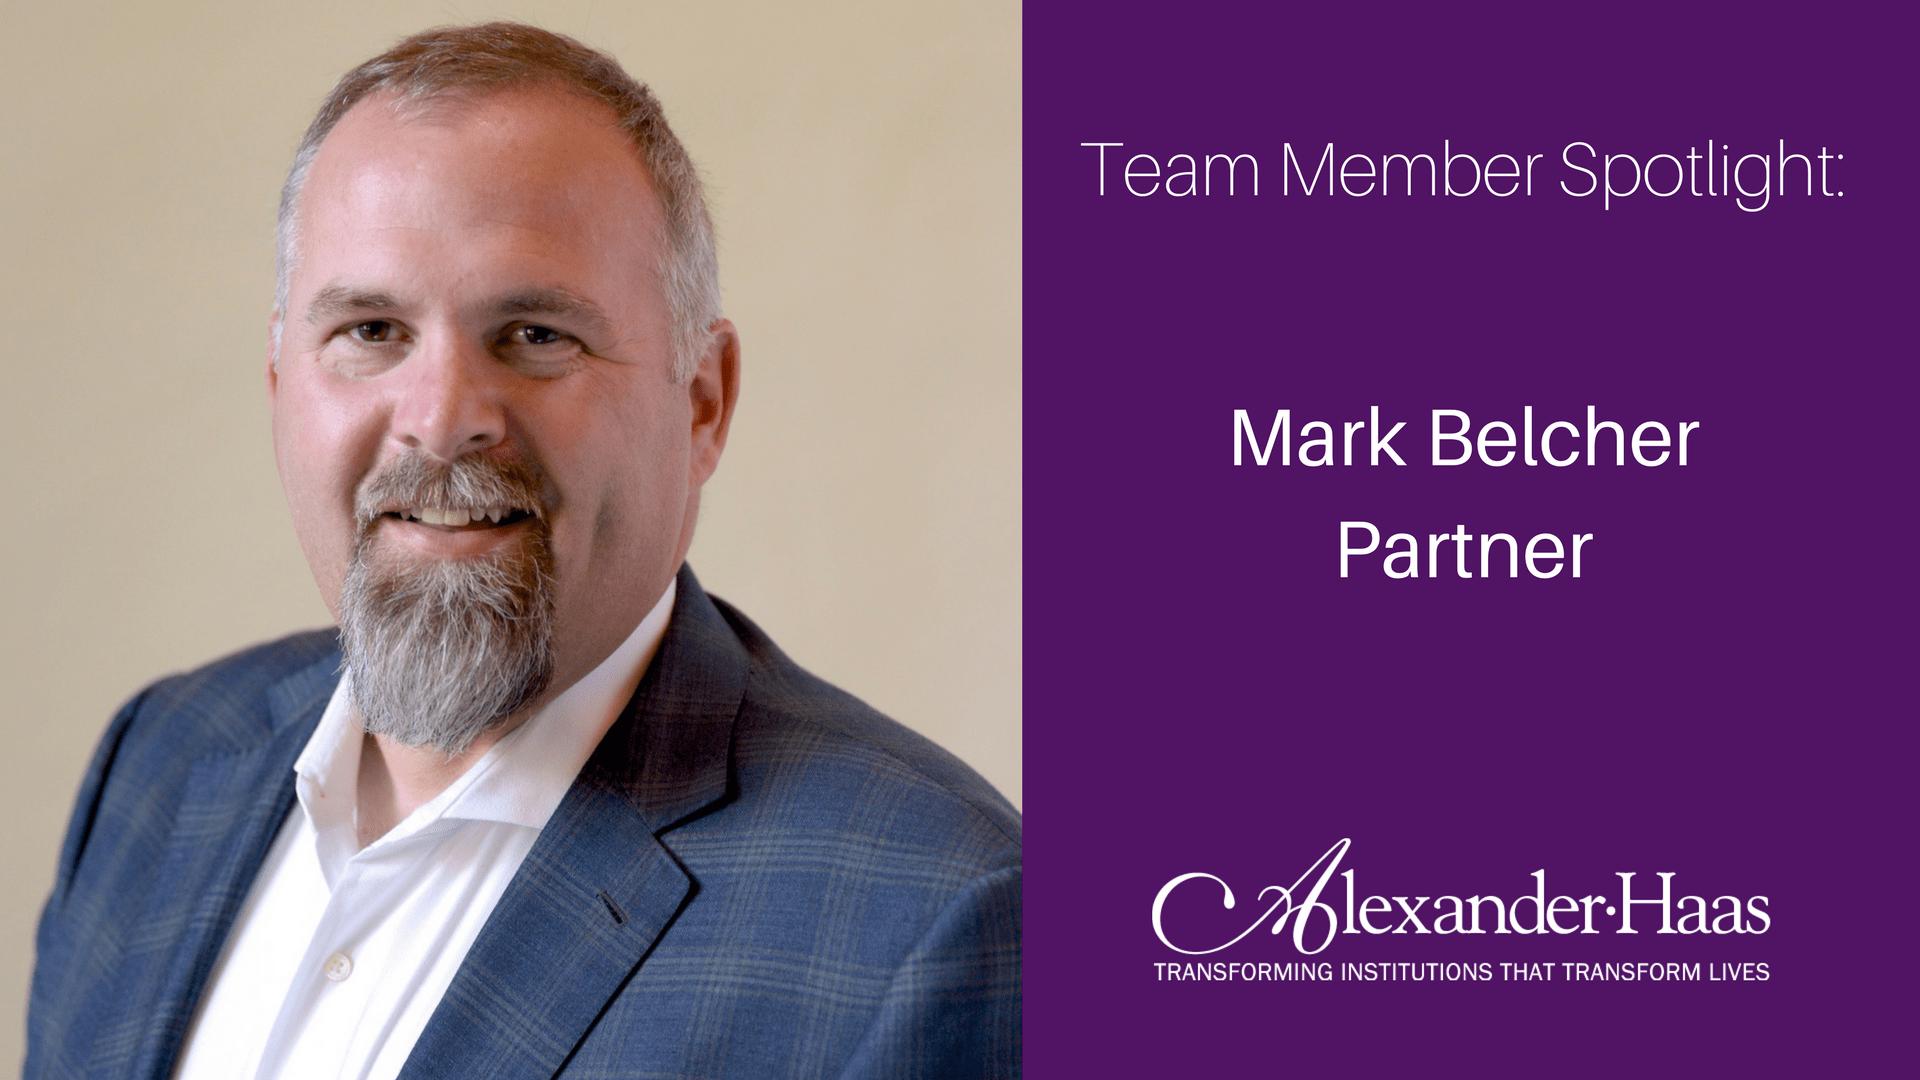 Fundraising Experts Team Member Spotlight: Mark Belcher